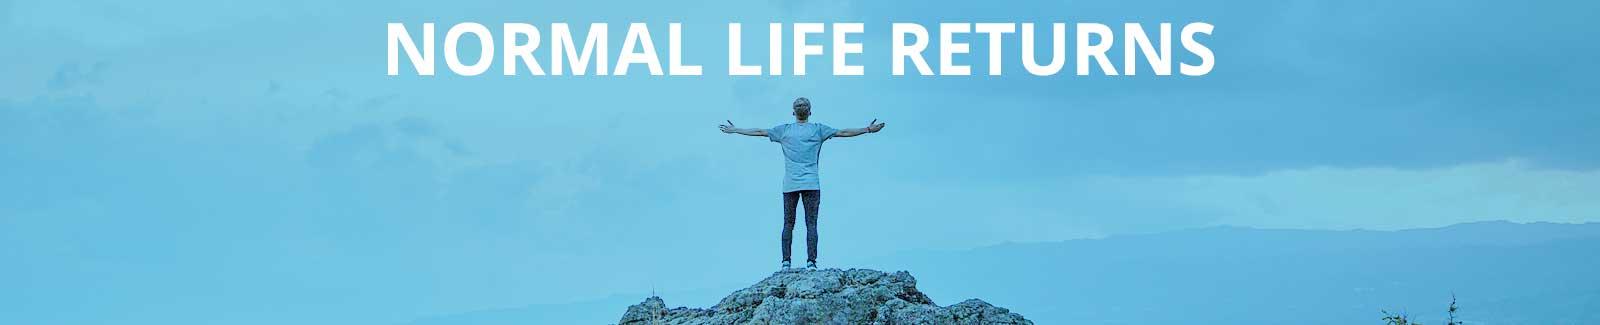 Pranicure - Normal life returns